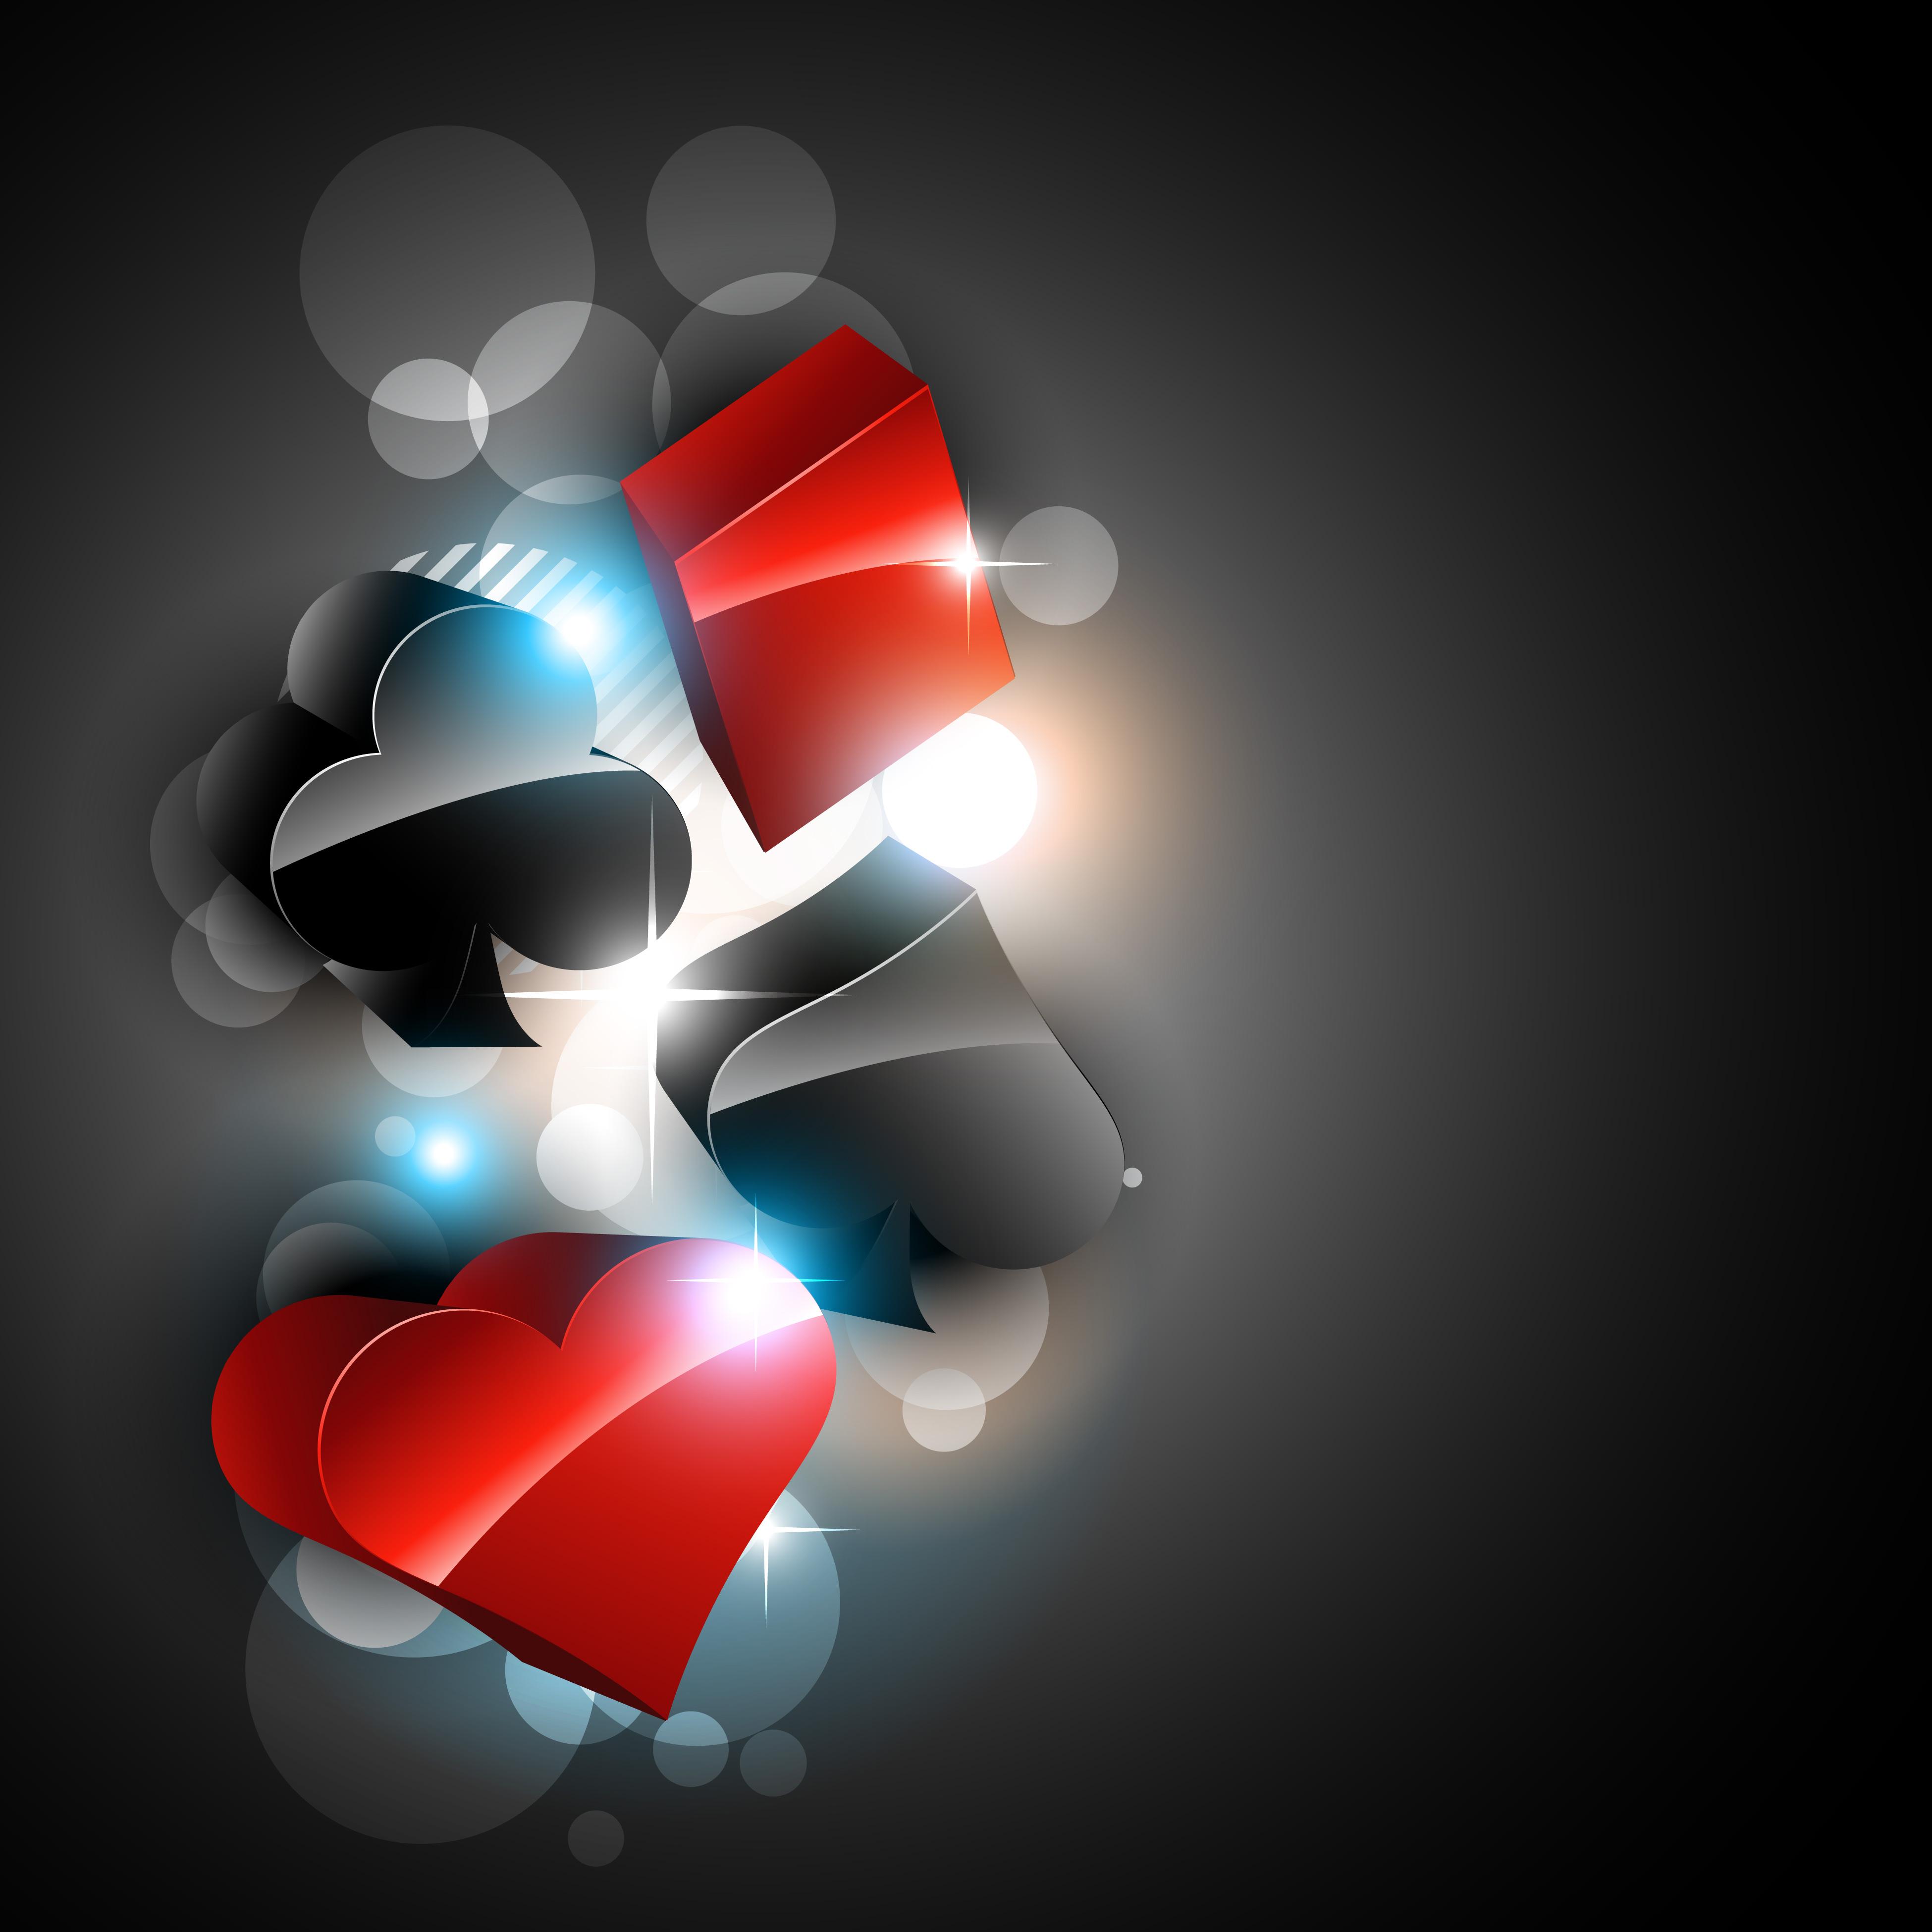 casino card element - Download Free Vector Art, Stock